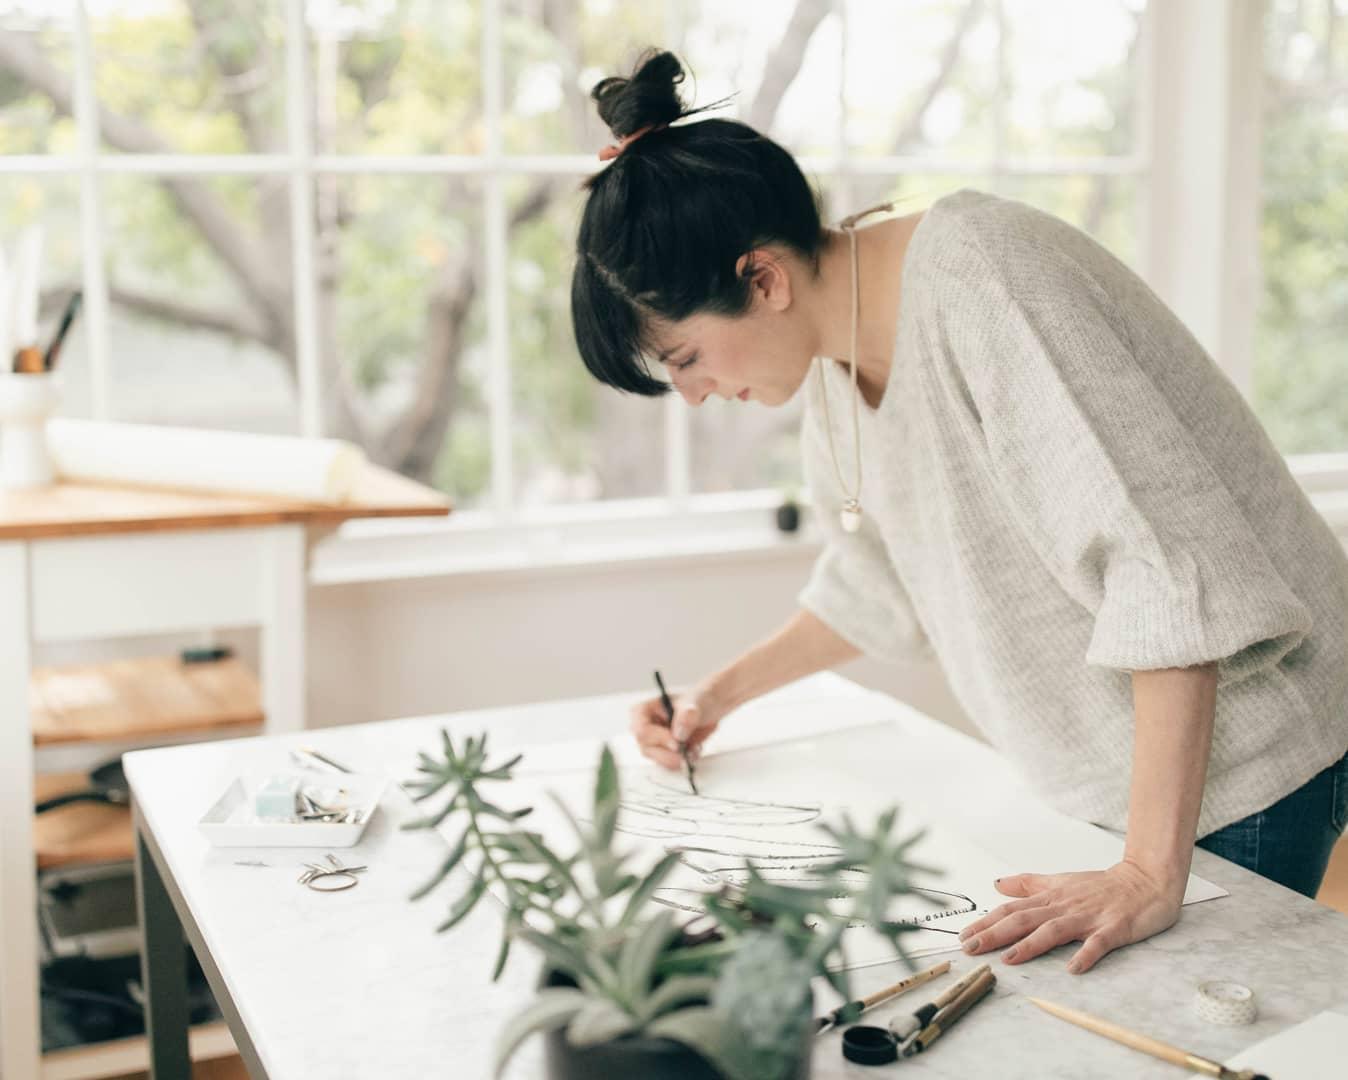 Minted artist Fernanda Martinez in her studio.